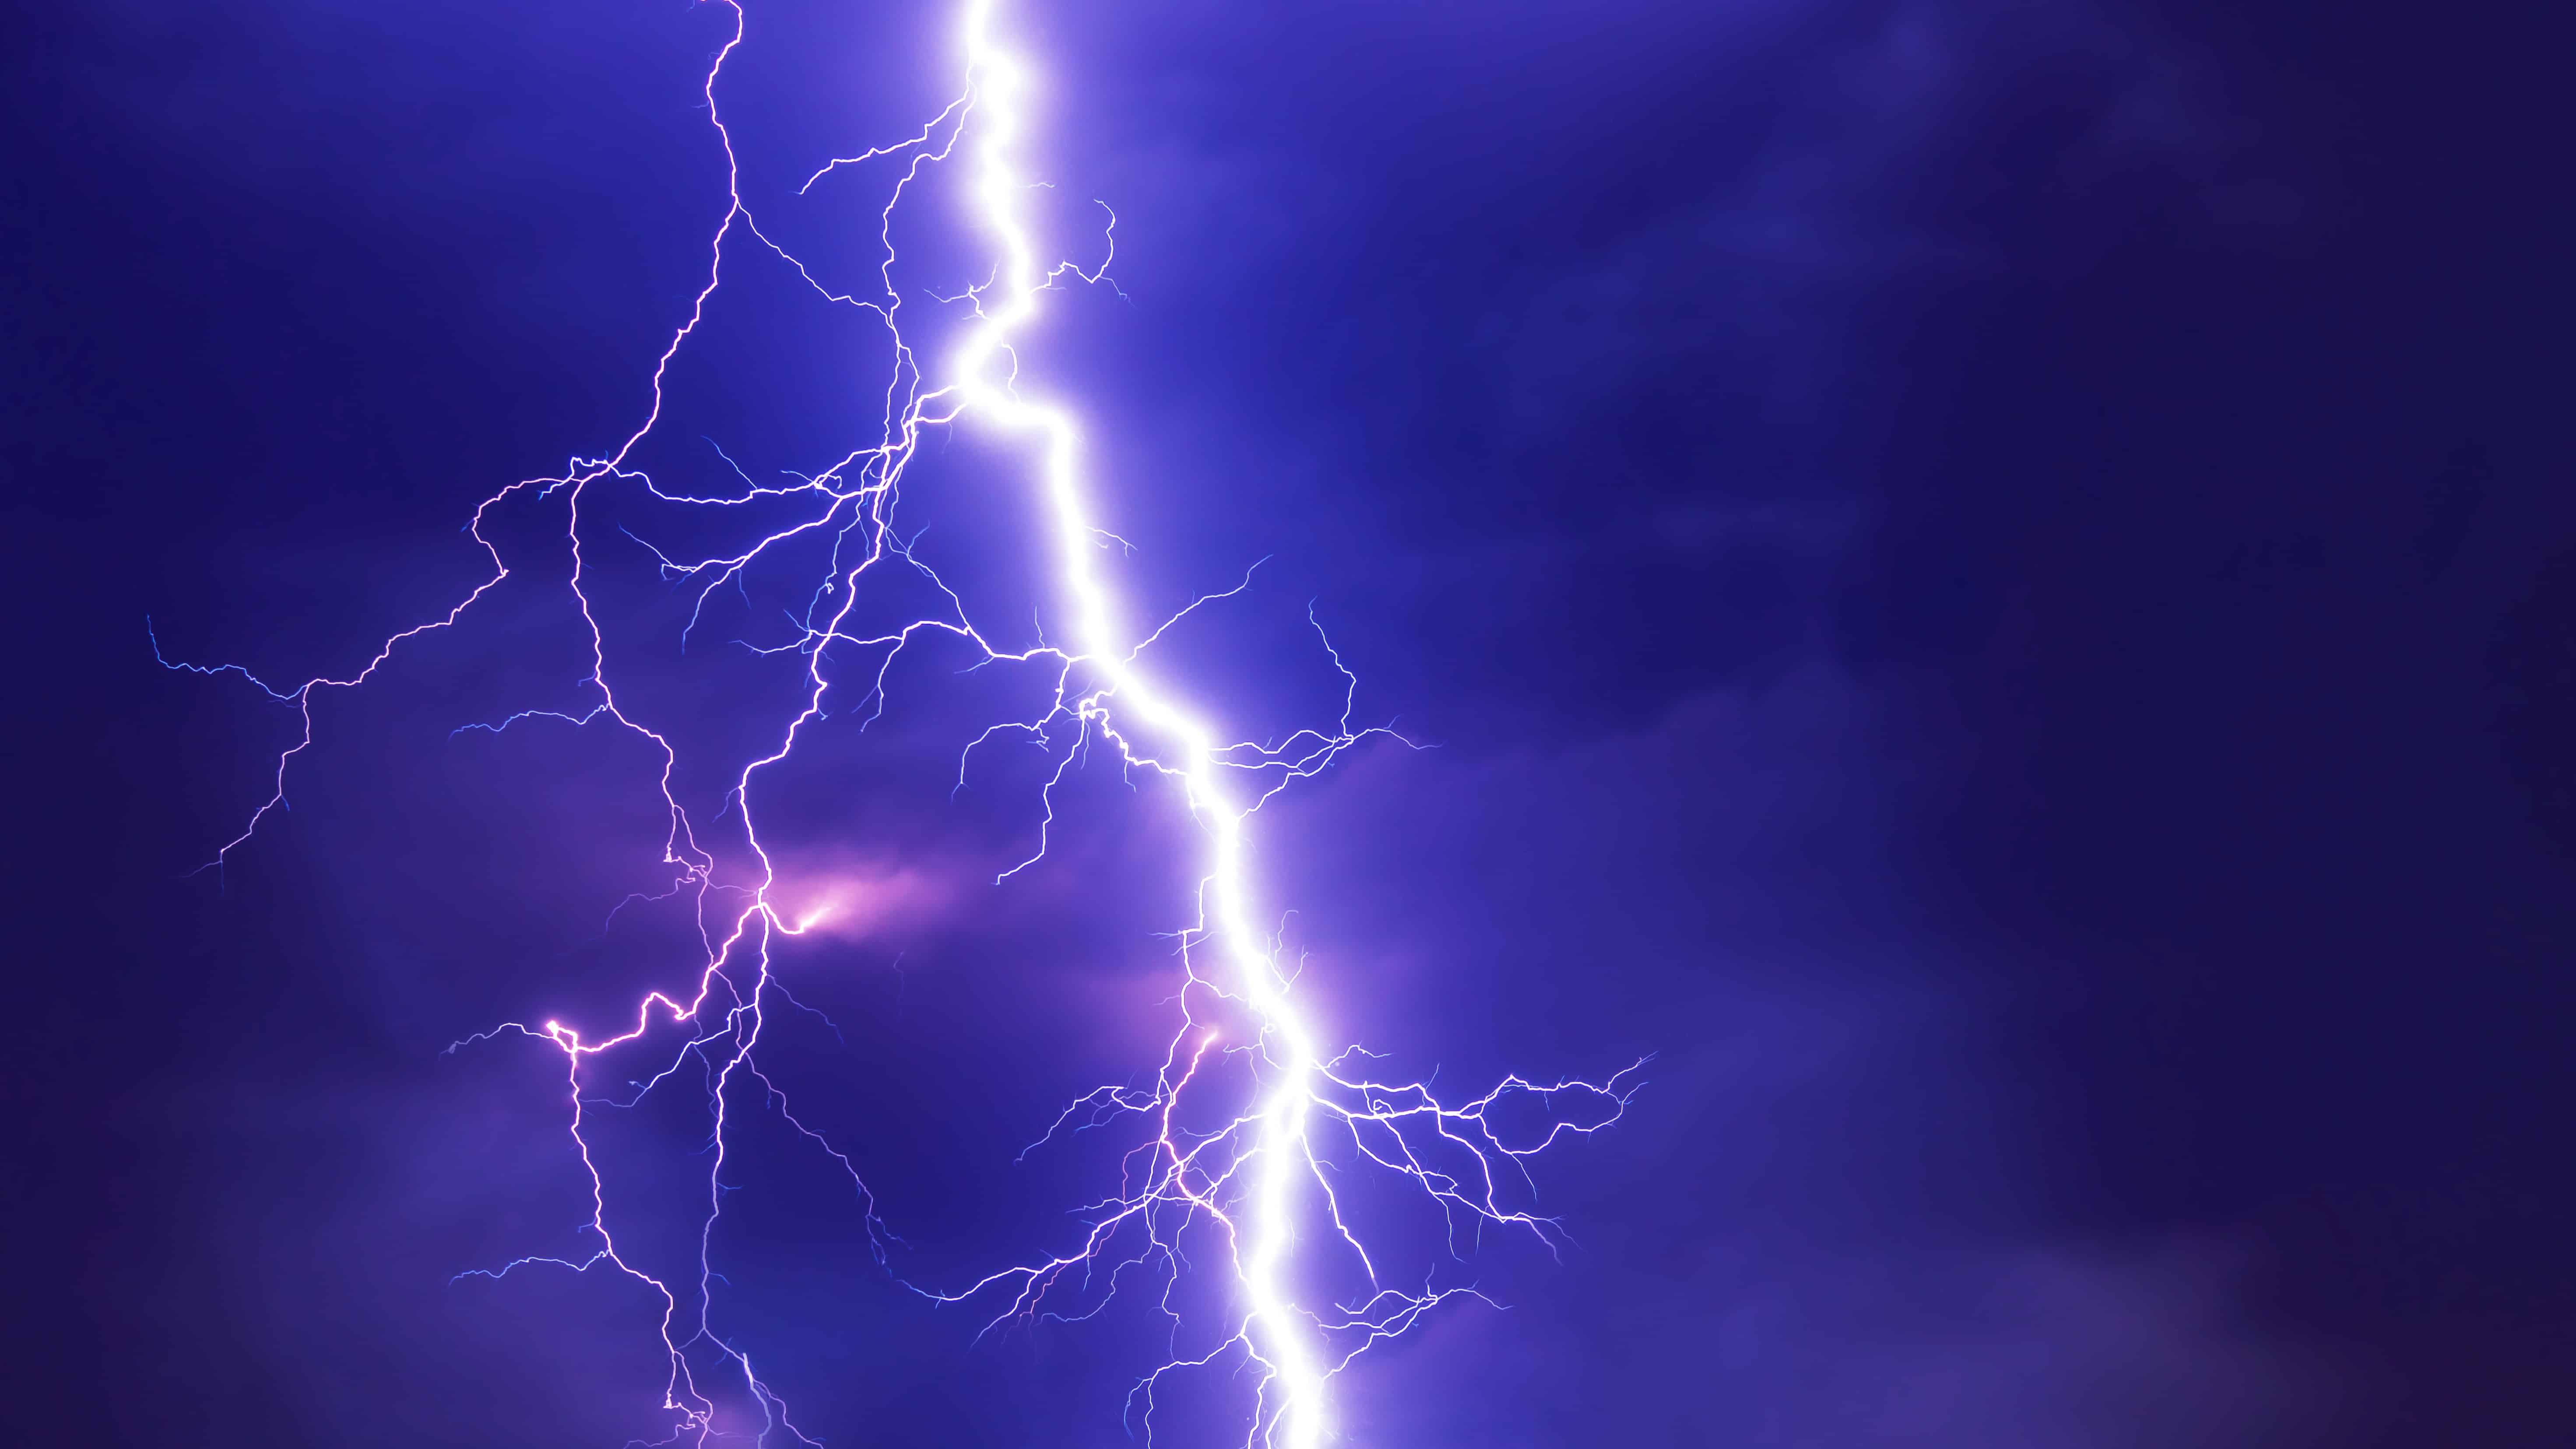 lightning, chemistry facts